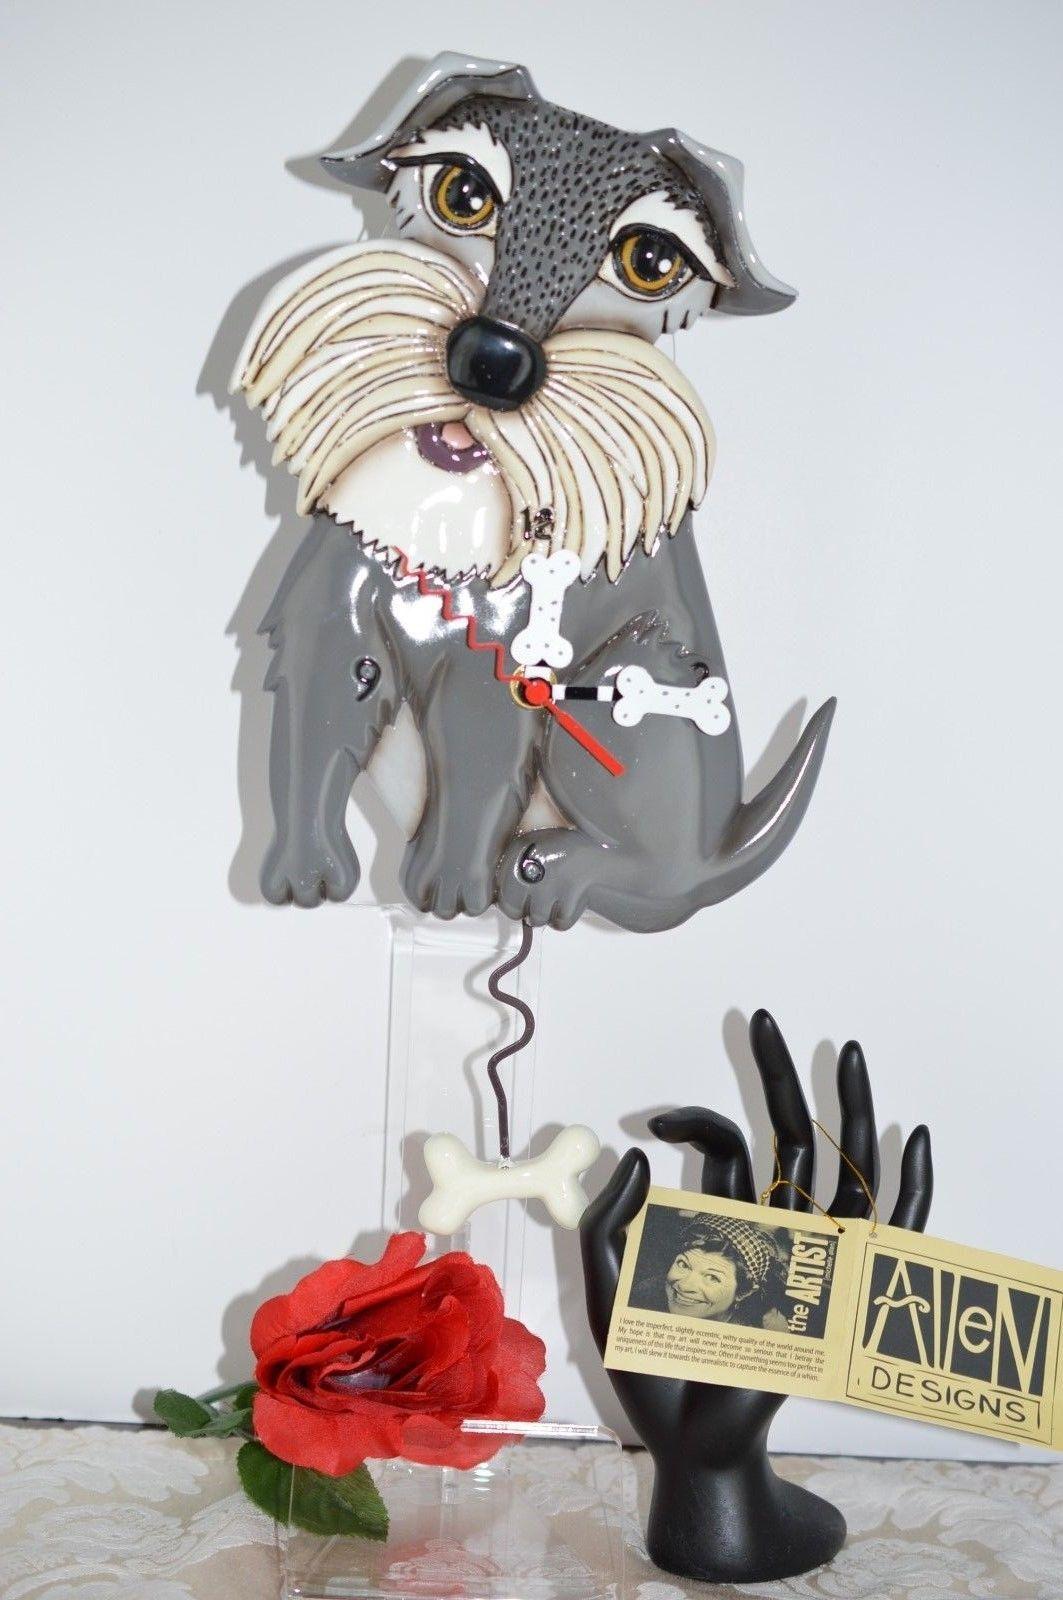 Michelle Allen Designs Whimsical Schnauzer Dog Clock Ship Priority In 24 Hrs Allendesignswallclocks Schnauzer Dogs Colorful Wall Clocks Whimsical